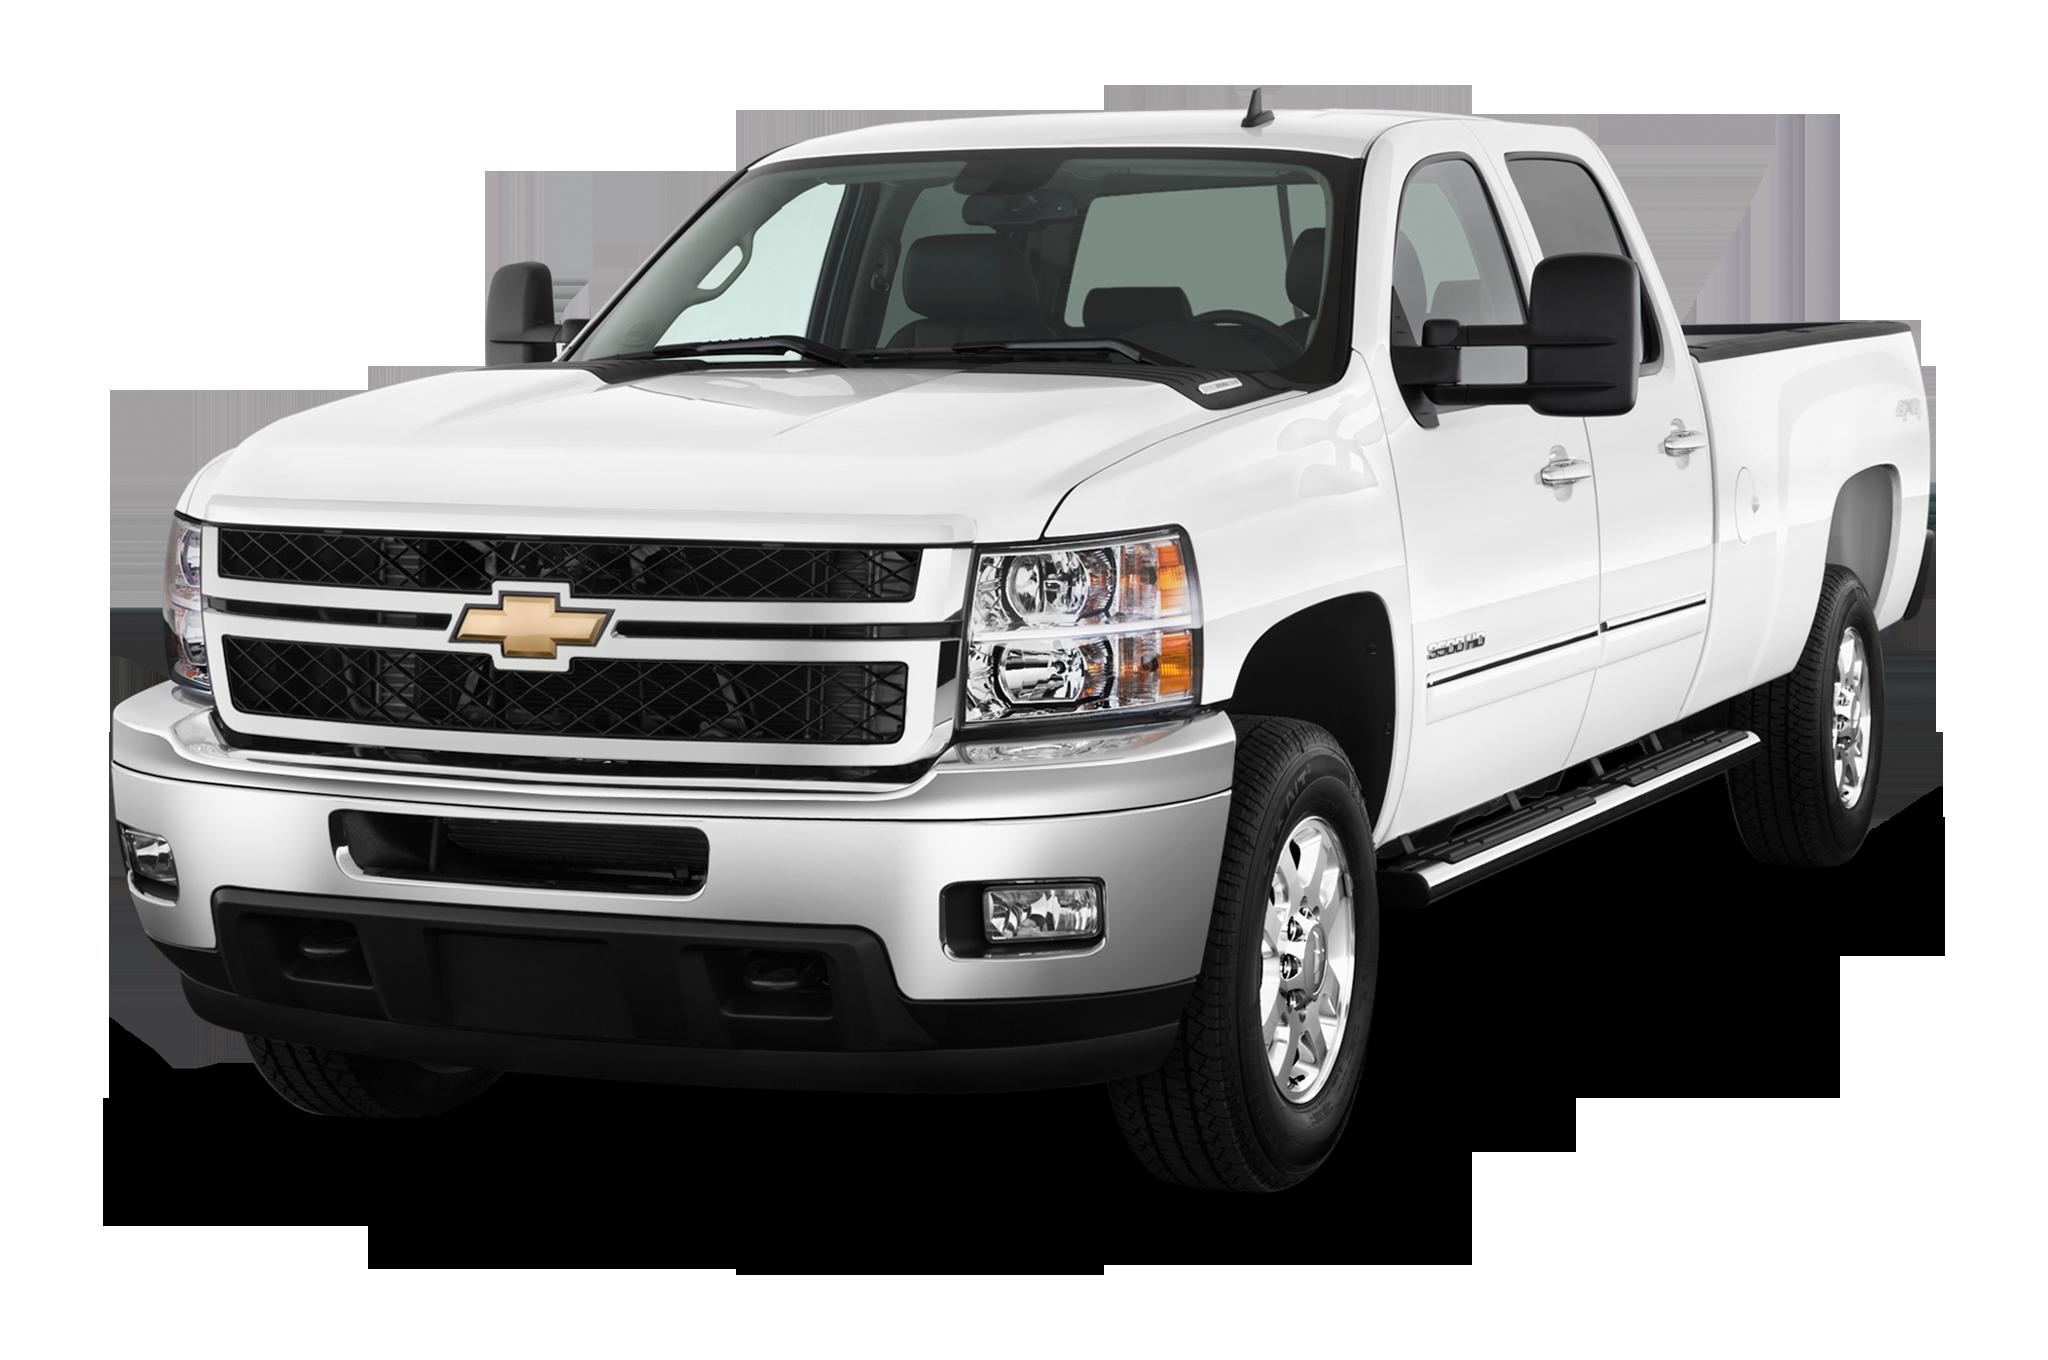 2013 colorado lands on chevrolet s list of 10 greatest trucks. Black Bedroom Furniture Sets. Home Design Ideas